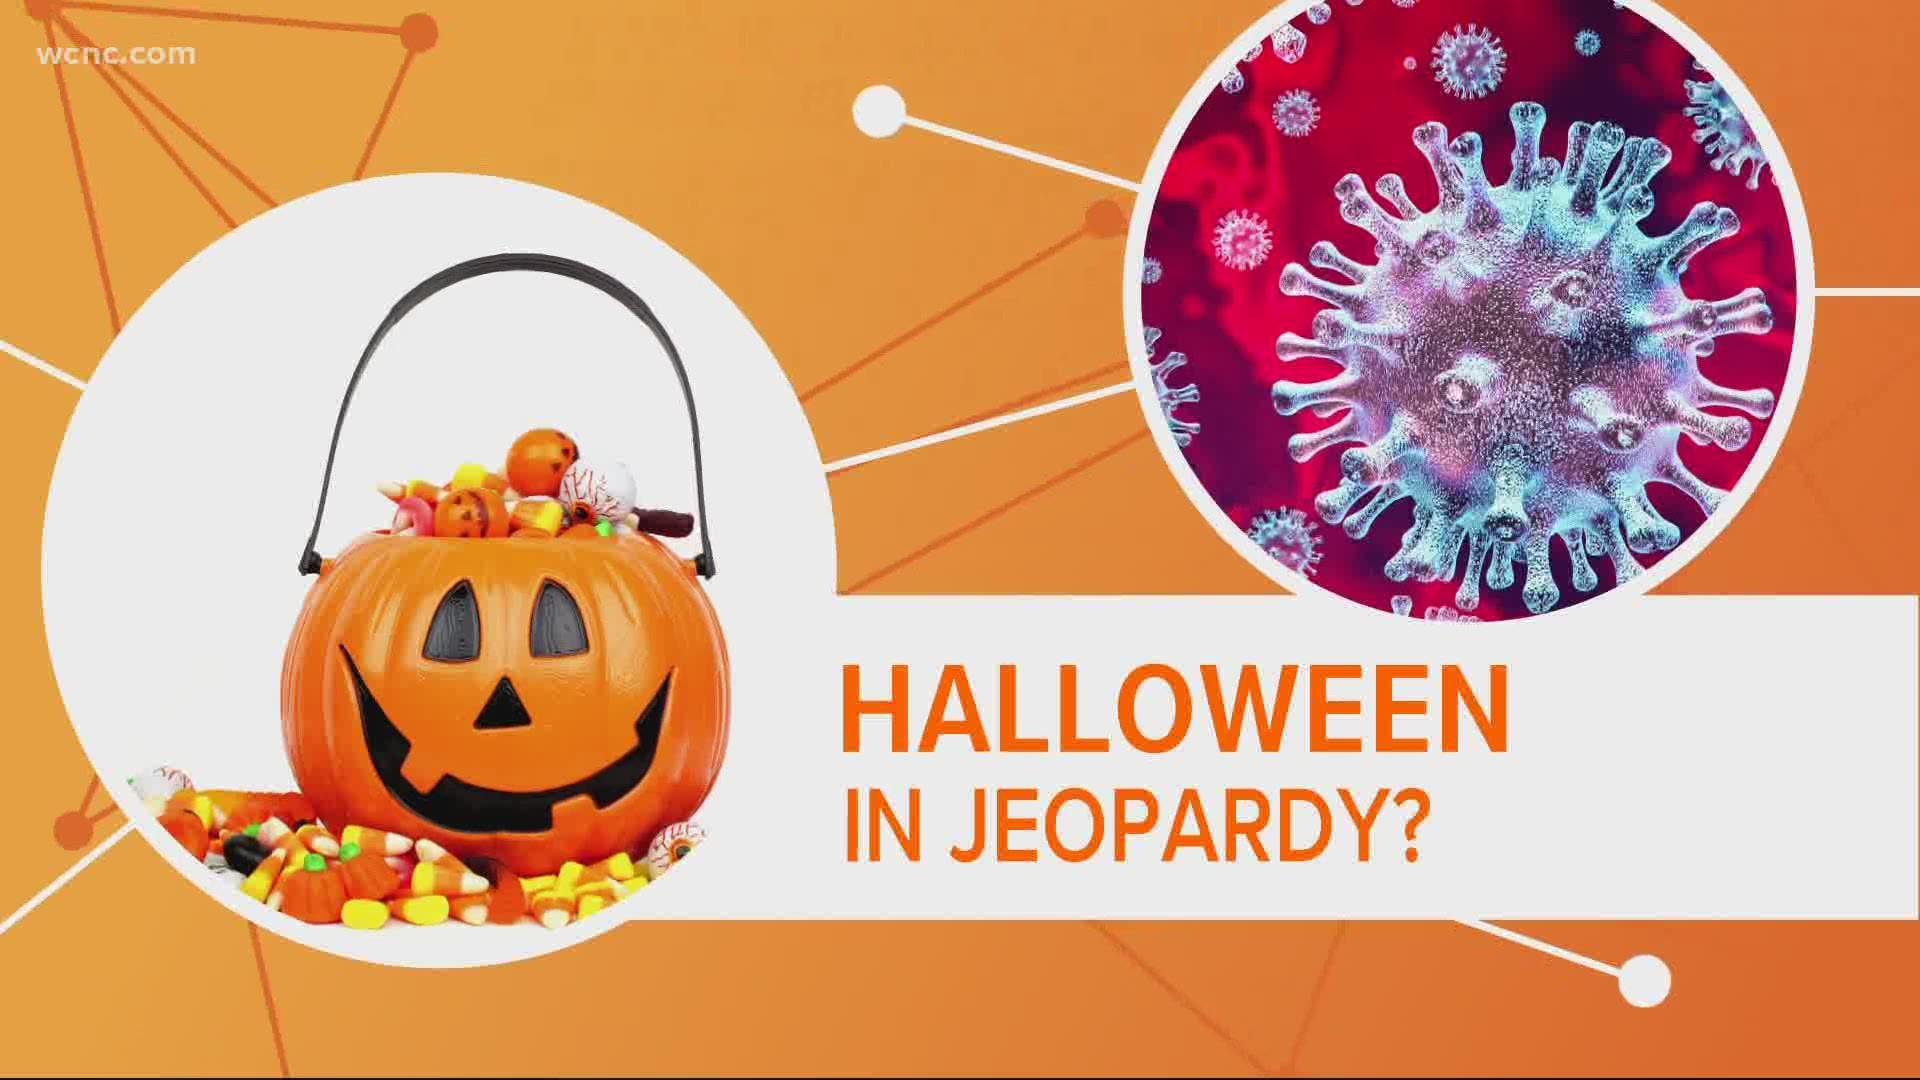 Cbs 2020 Halloween Trick or treat: Will COVID 19 cancel Halloween in 2020? | cbs8.com